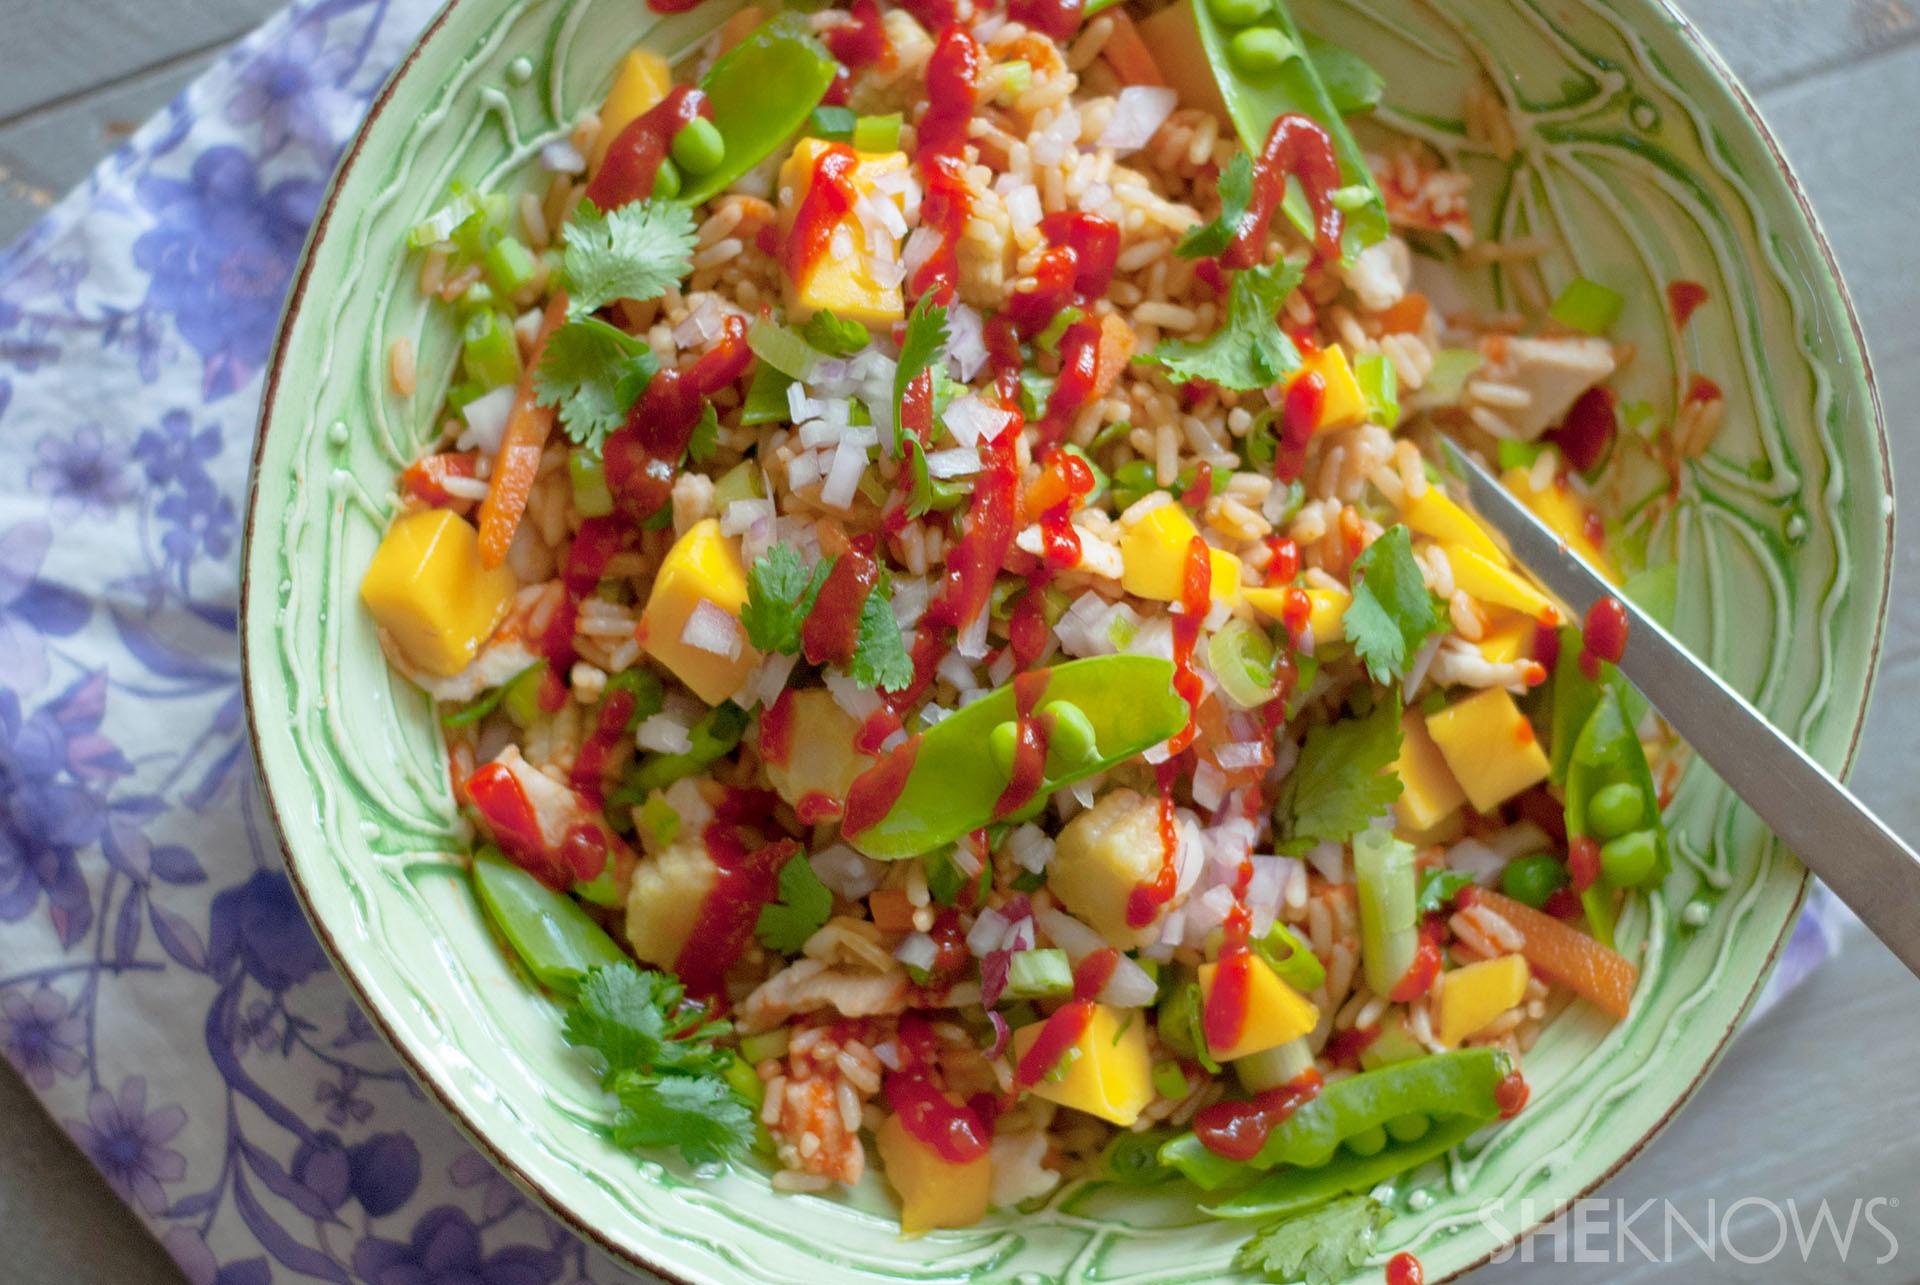 Sweet and spicy mango siracha fried recipe°